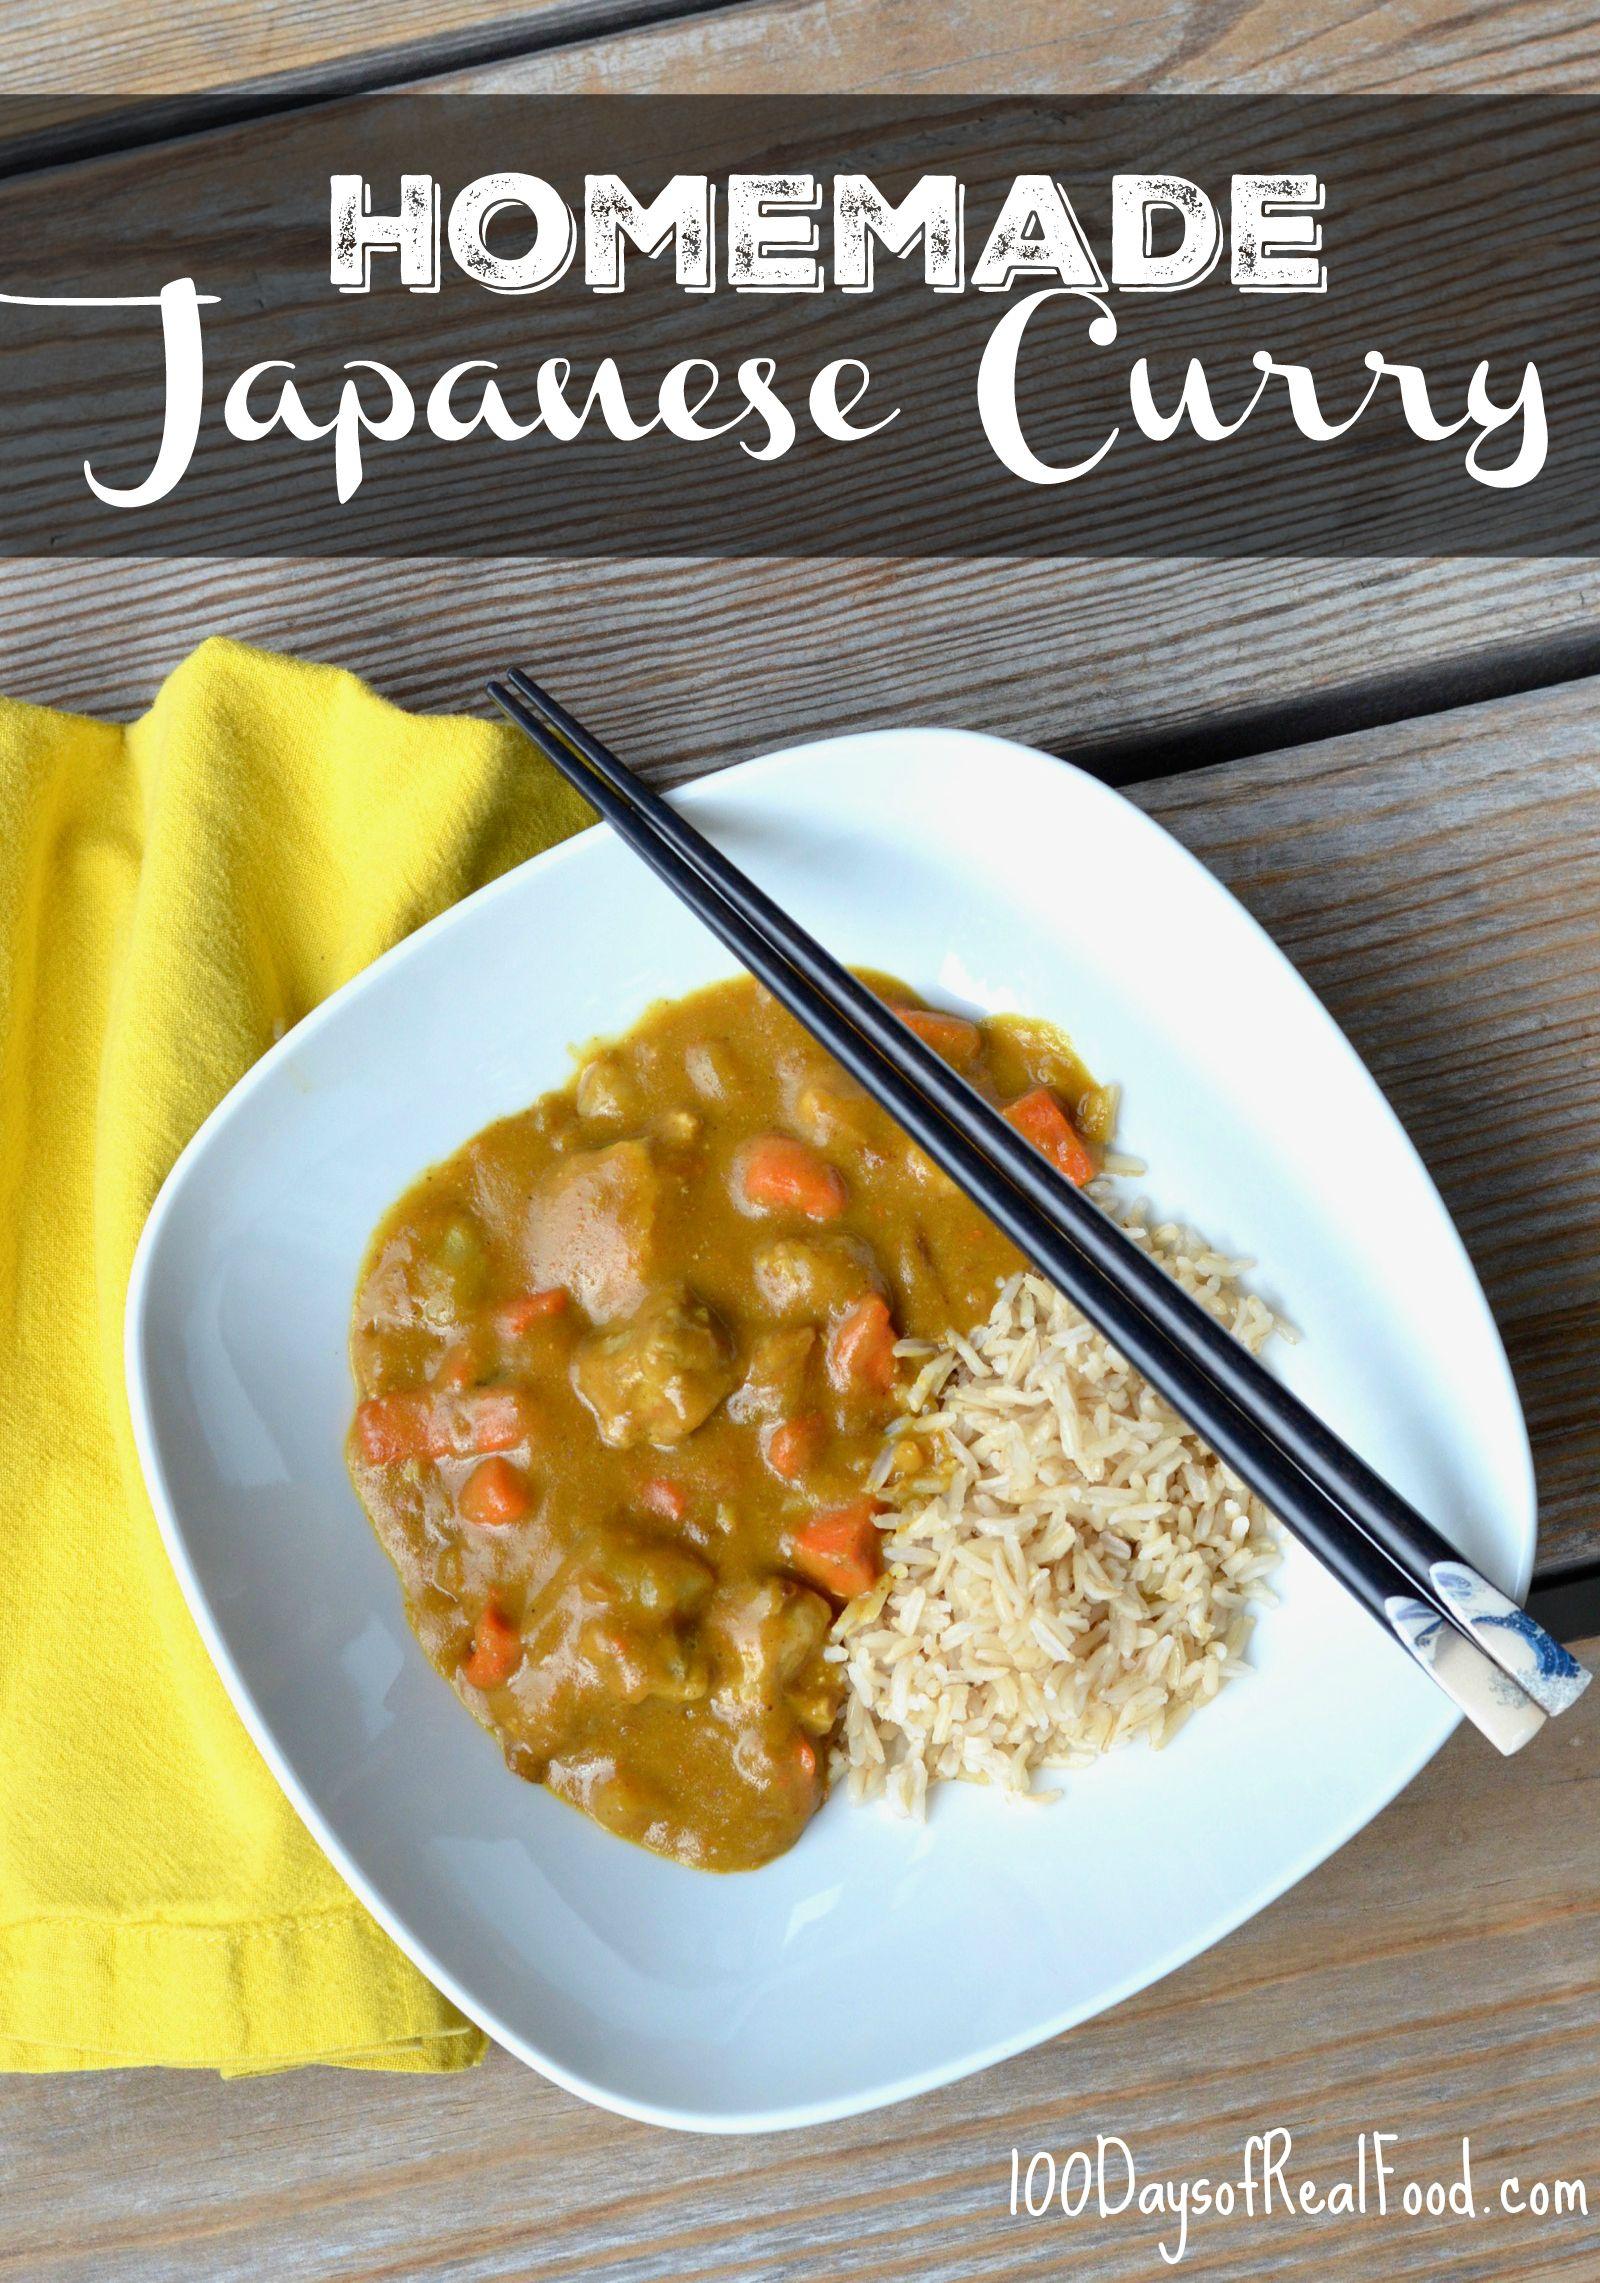 Homemade Japanese Curry Recipe Homemade Japanese Curry Recipe Curry Recipes Easy Japanese Curry